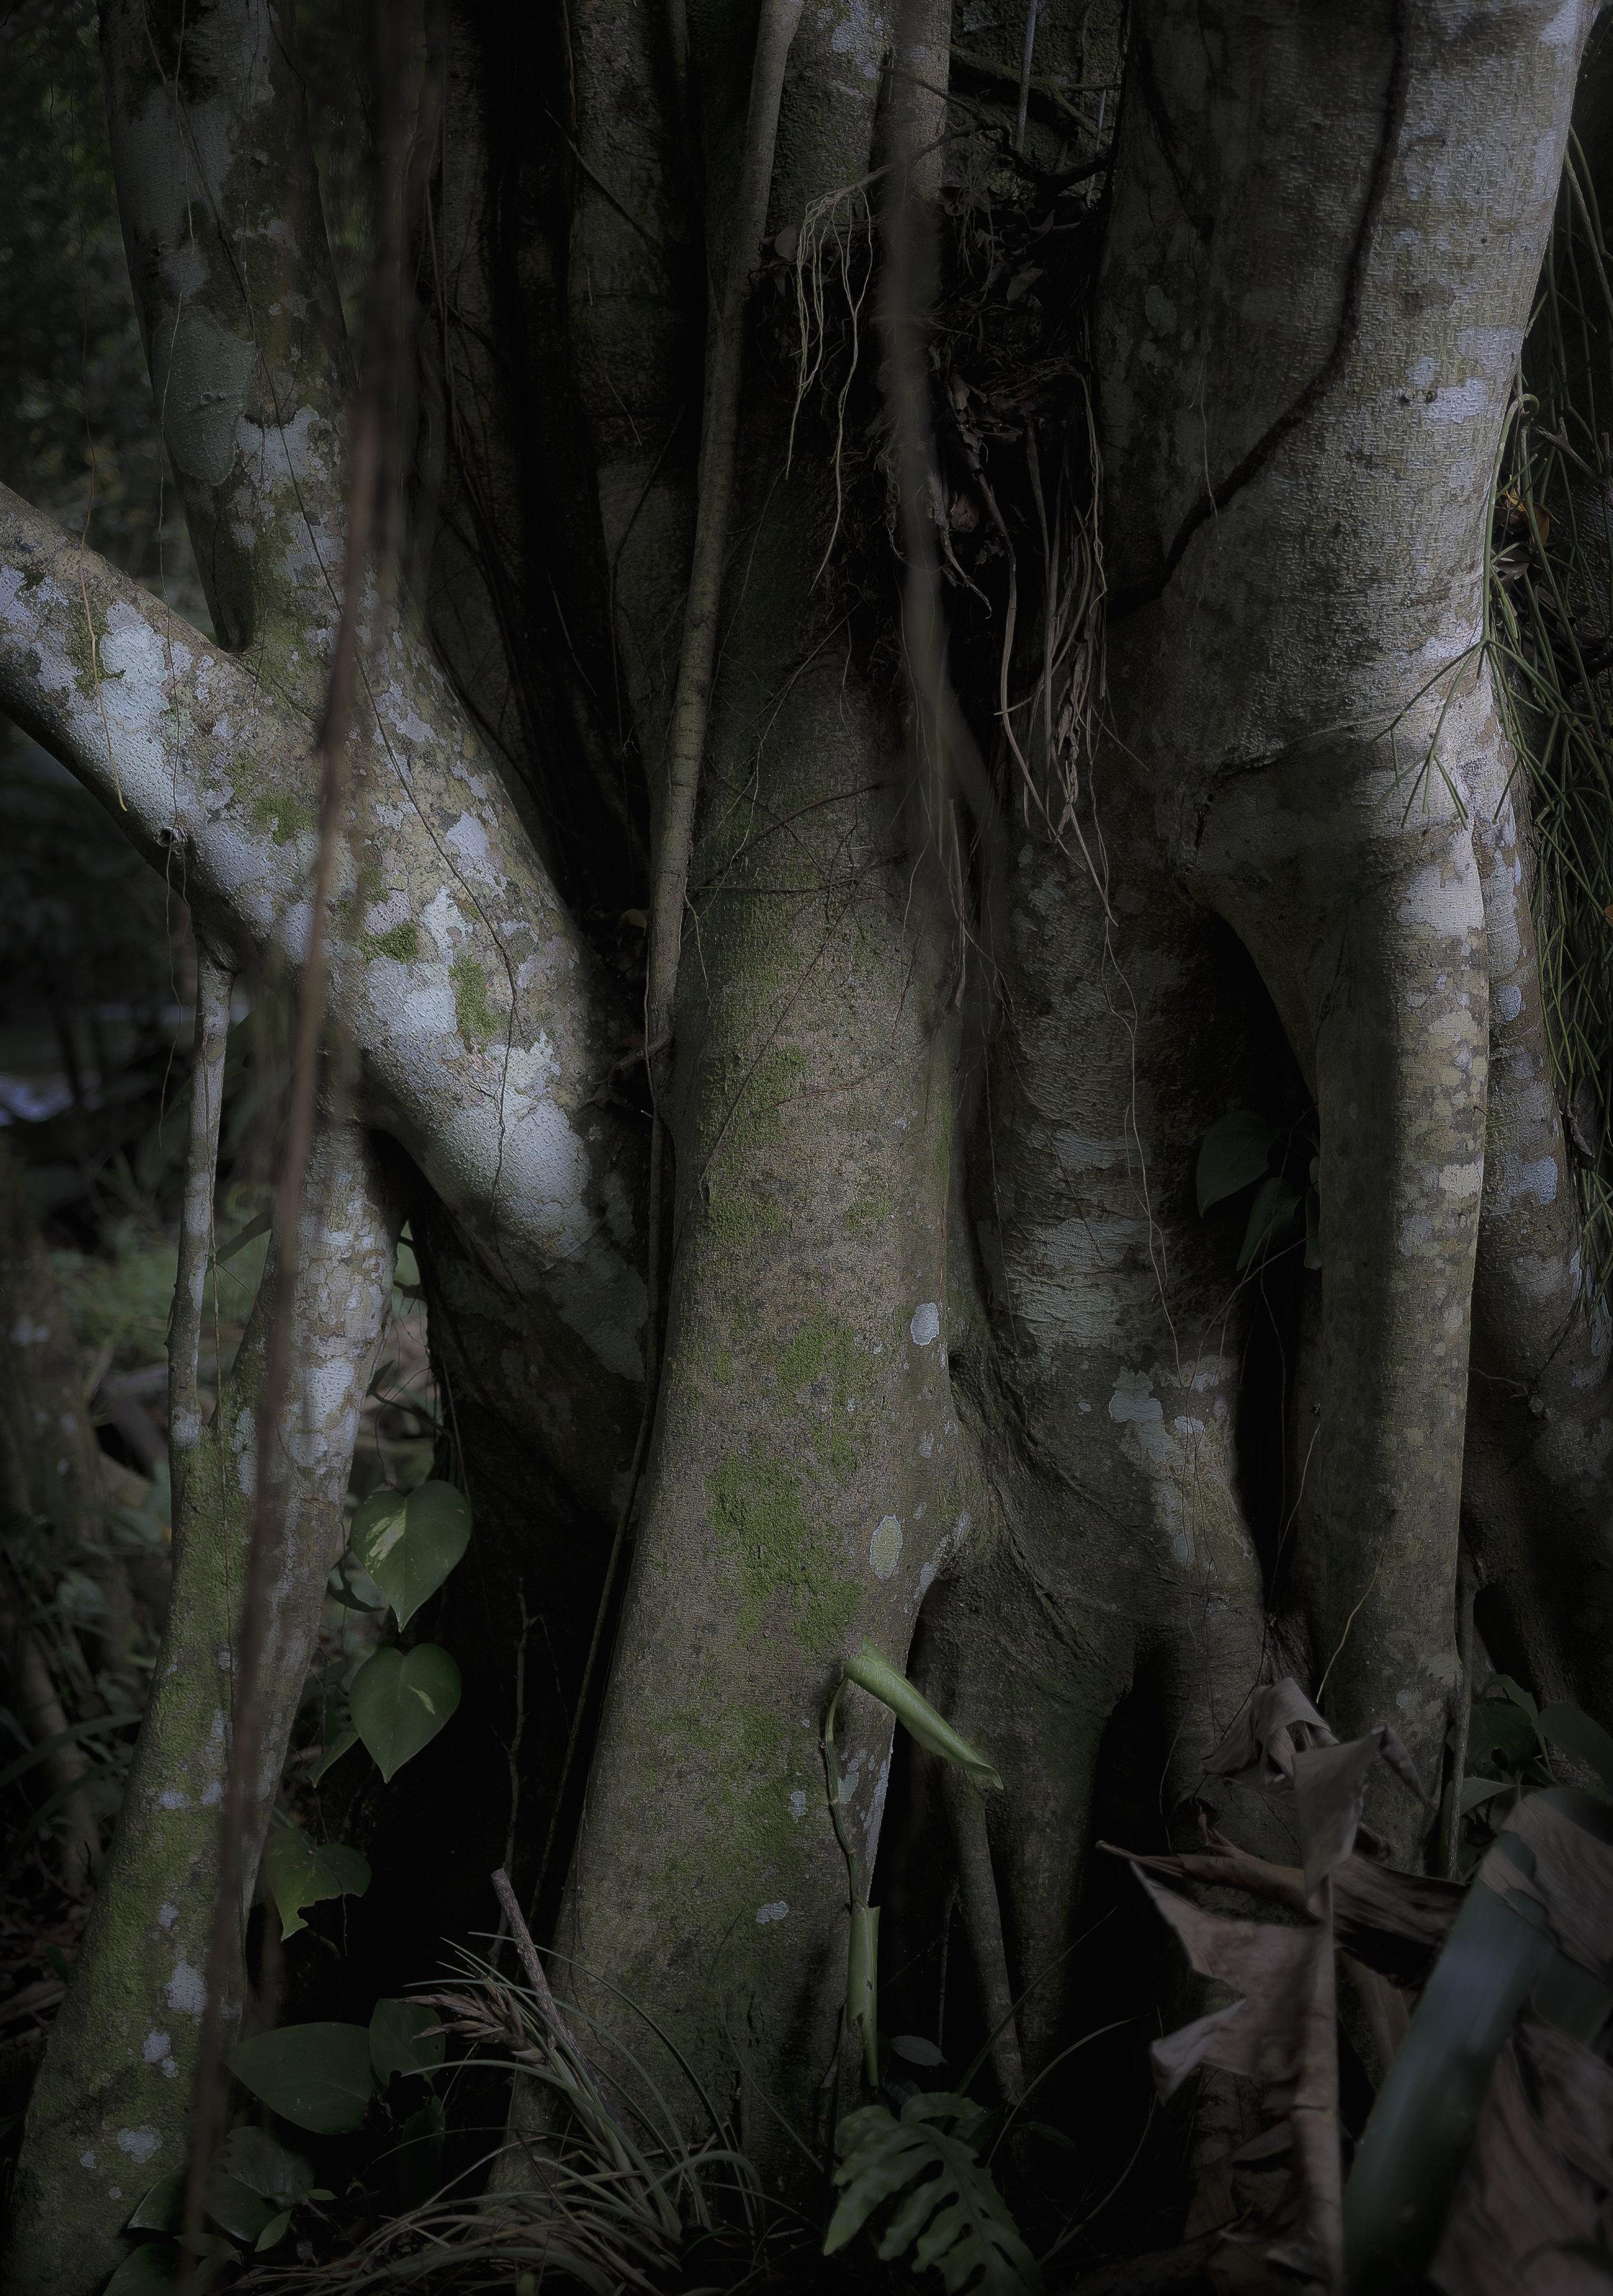 Untitled Rainforest (Jamaica), 2018